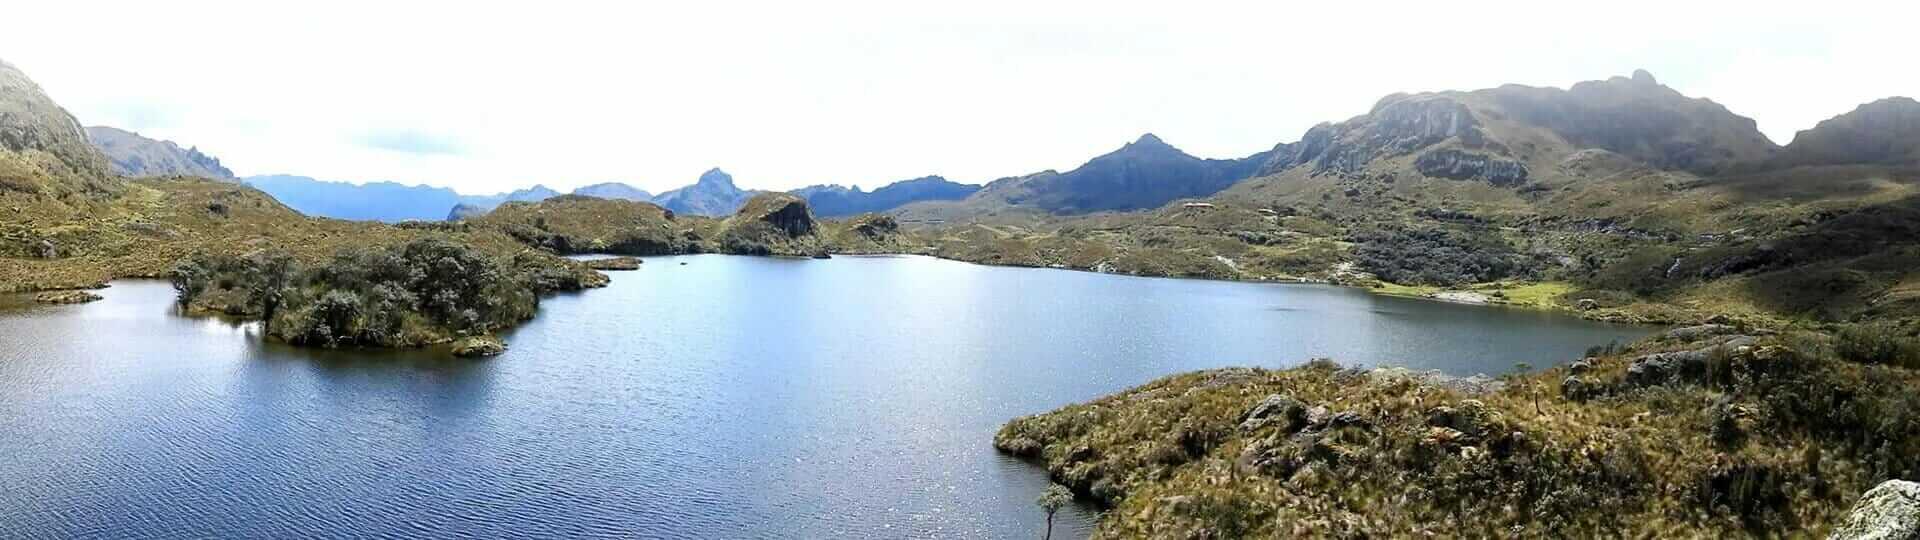 el cajas national park landscape ecuador